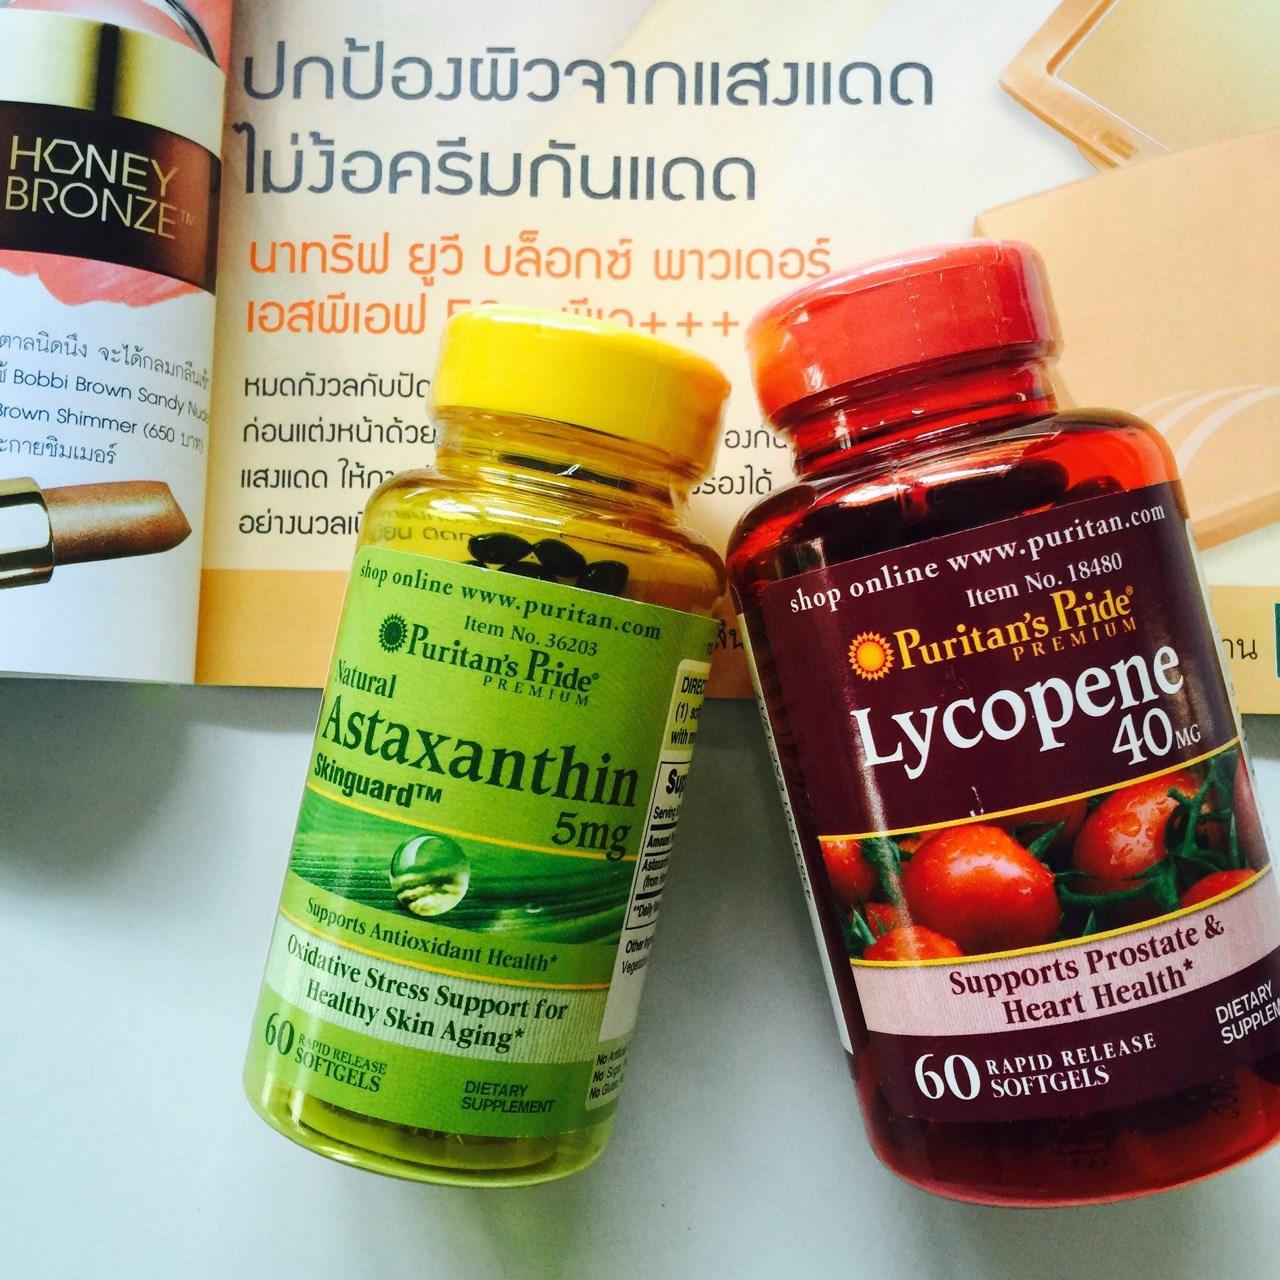 Puritan's Pride Astaxanthin 5 mg 60 Softgels แอสตาแซนธิน + Puritan Lycopene 40 mg/60 Softgel สารสกัดจากมะเขือเทศเข้มข้น เซ็ทผิวขาวอมชมพู ผิวอ่อนเยาว์ ป้องกันแสงแดด